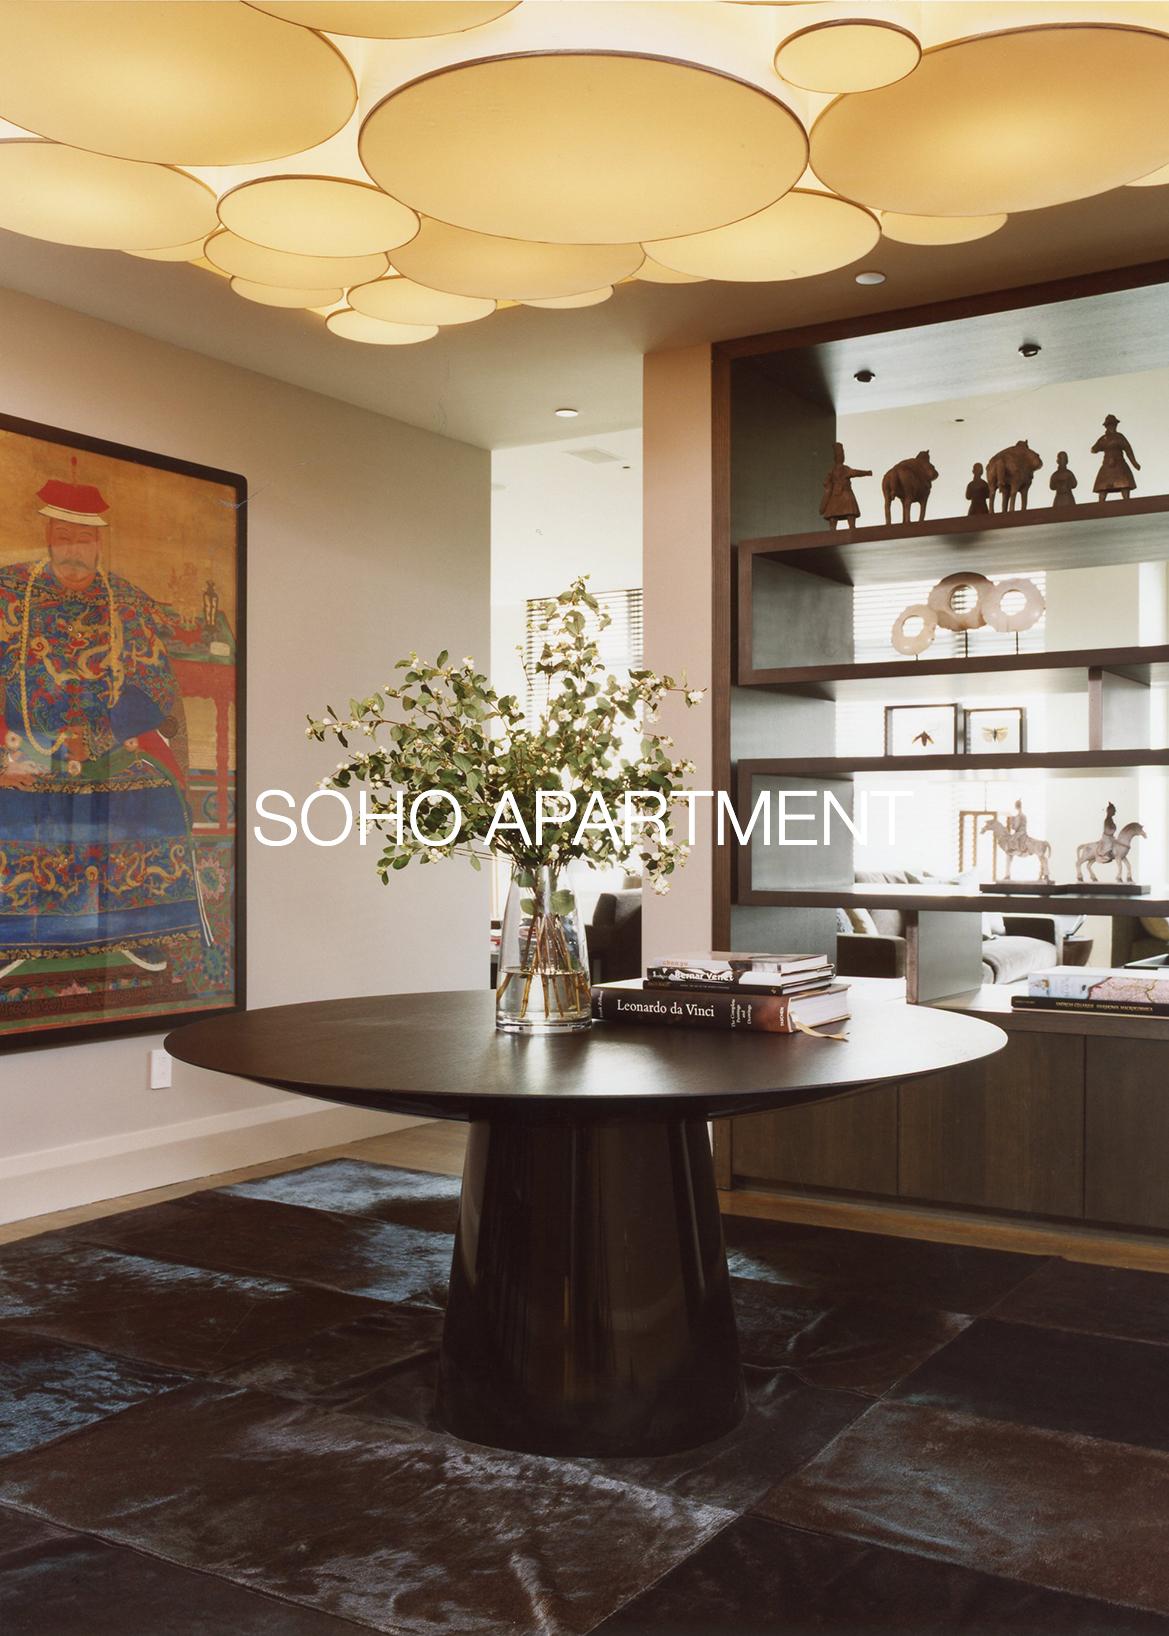 Soho Apartment.jpg